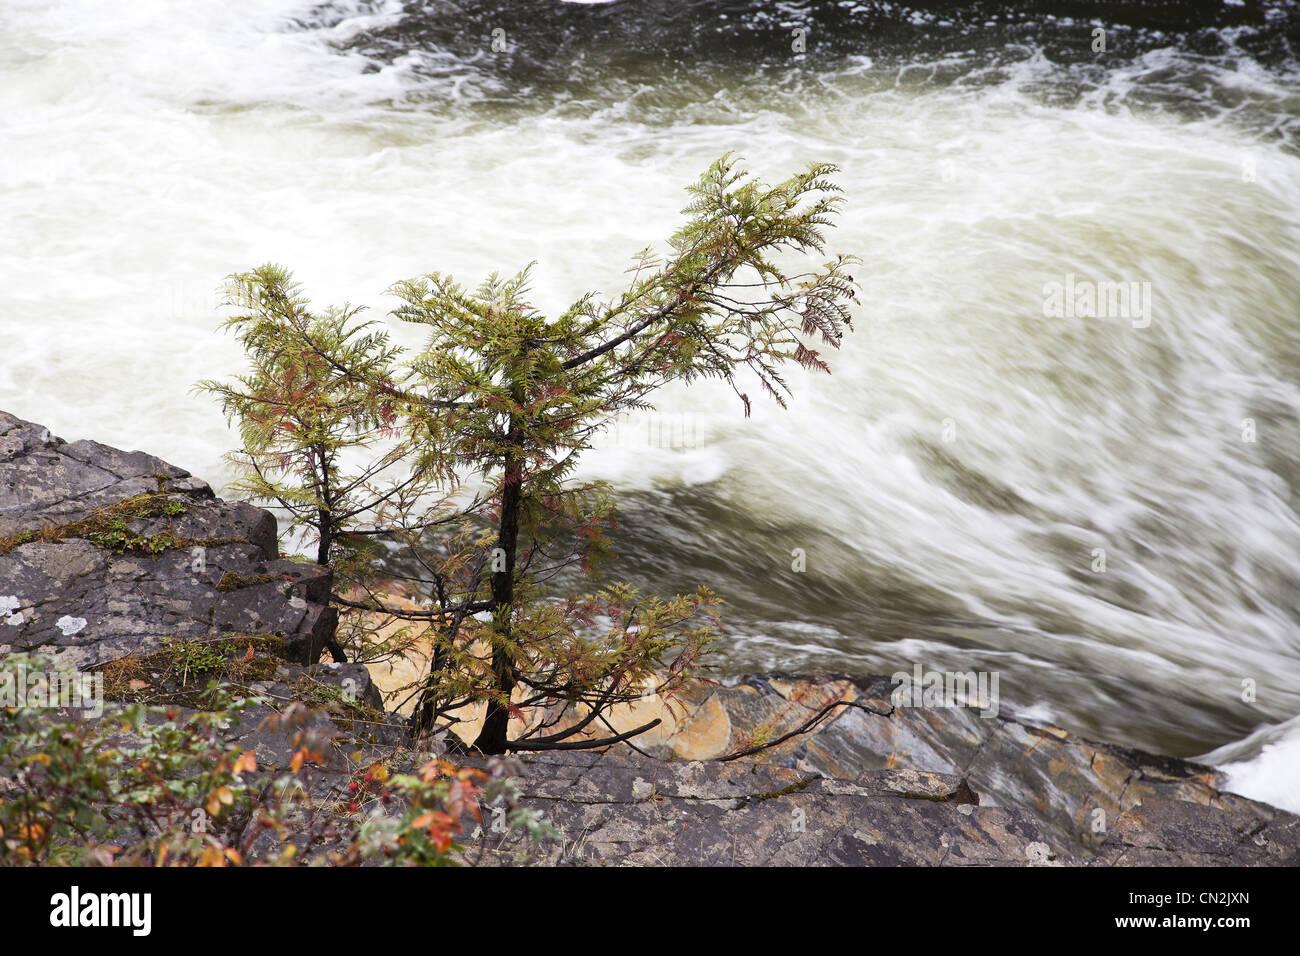 Small Tree Next to River Rapids, Montana, USA - Stock Image